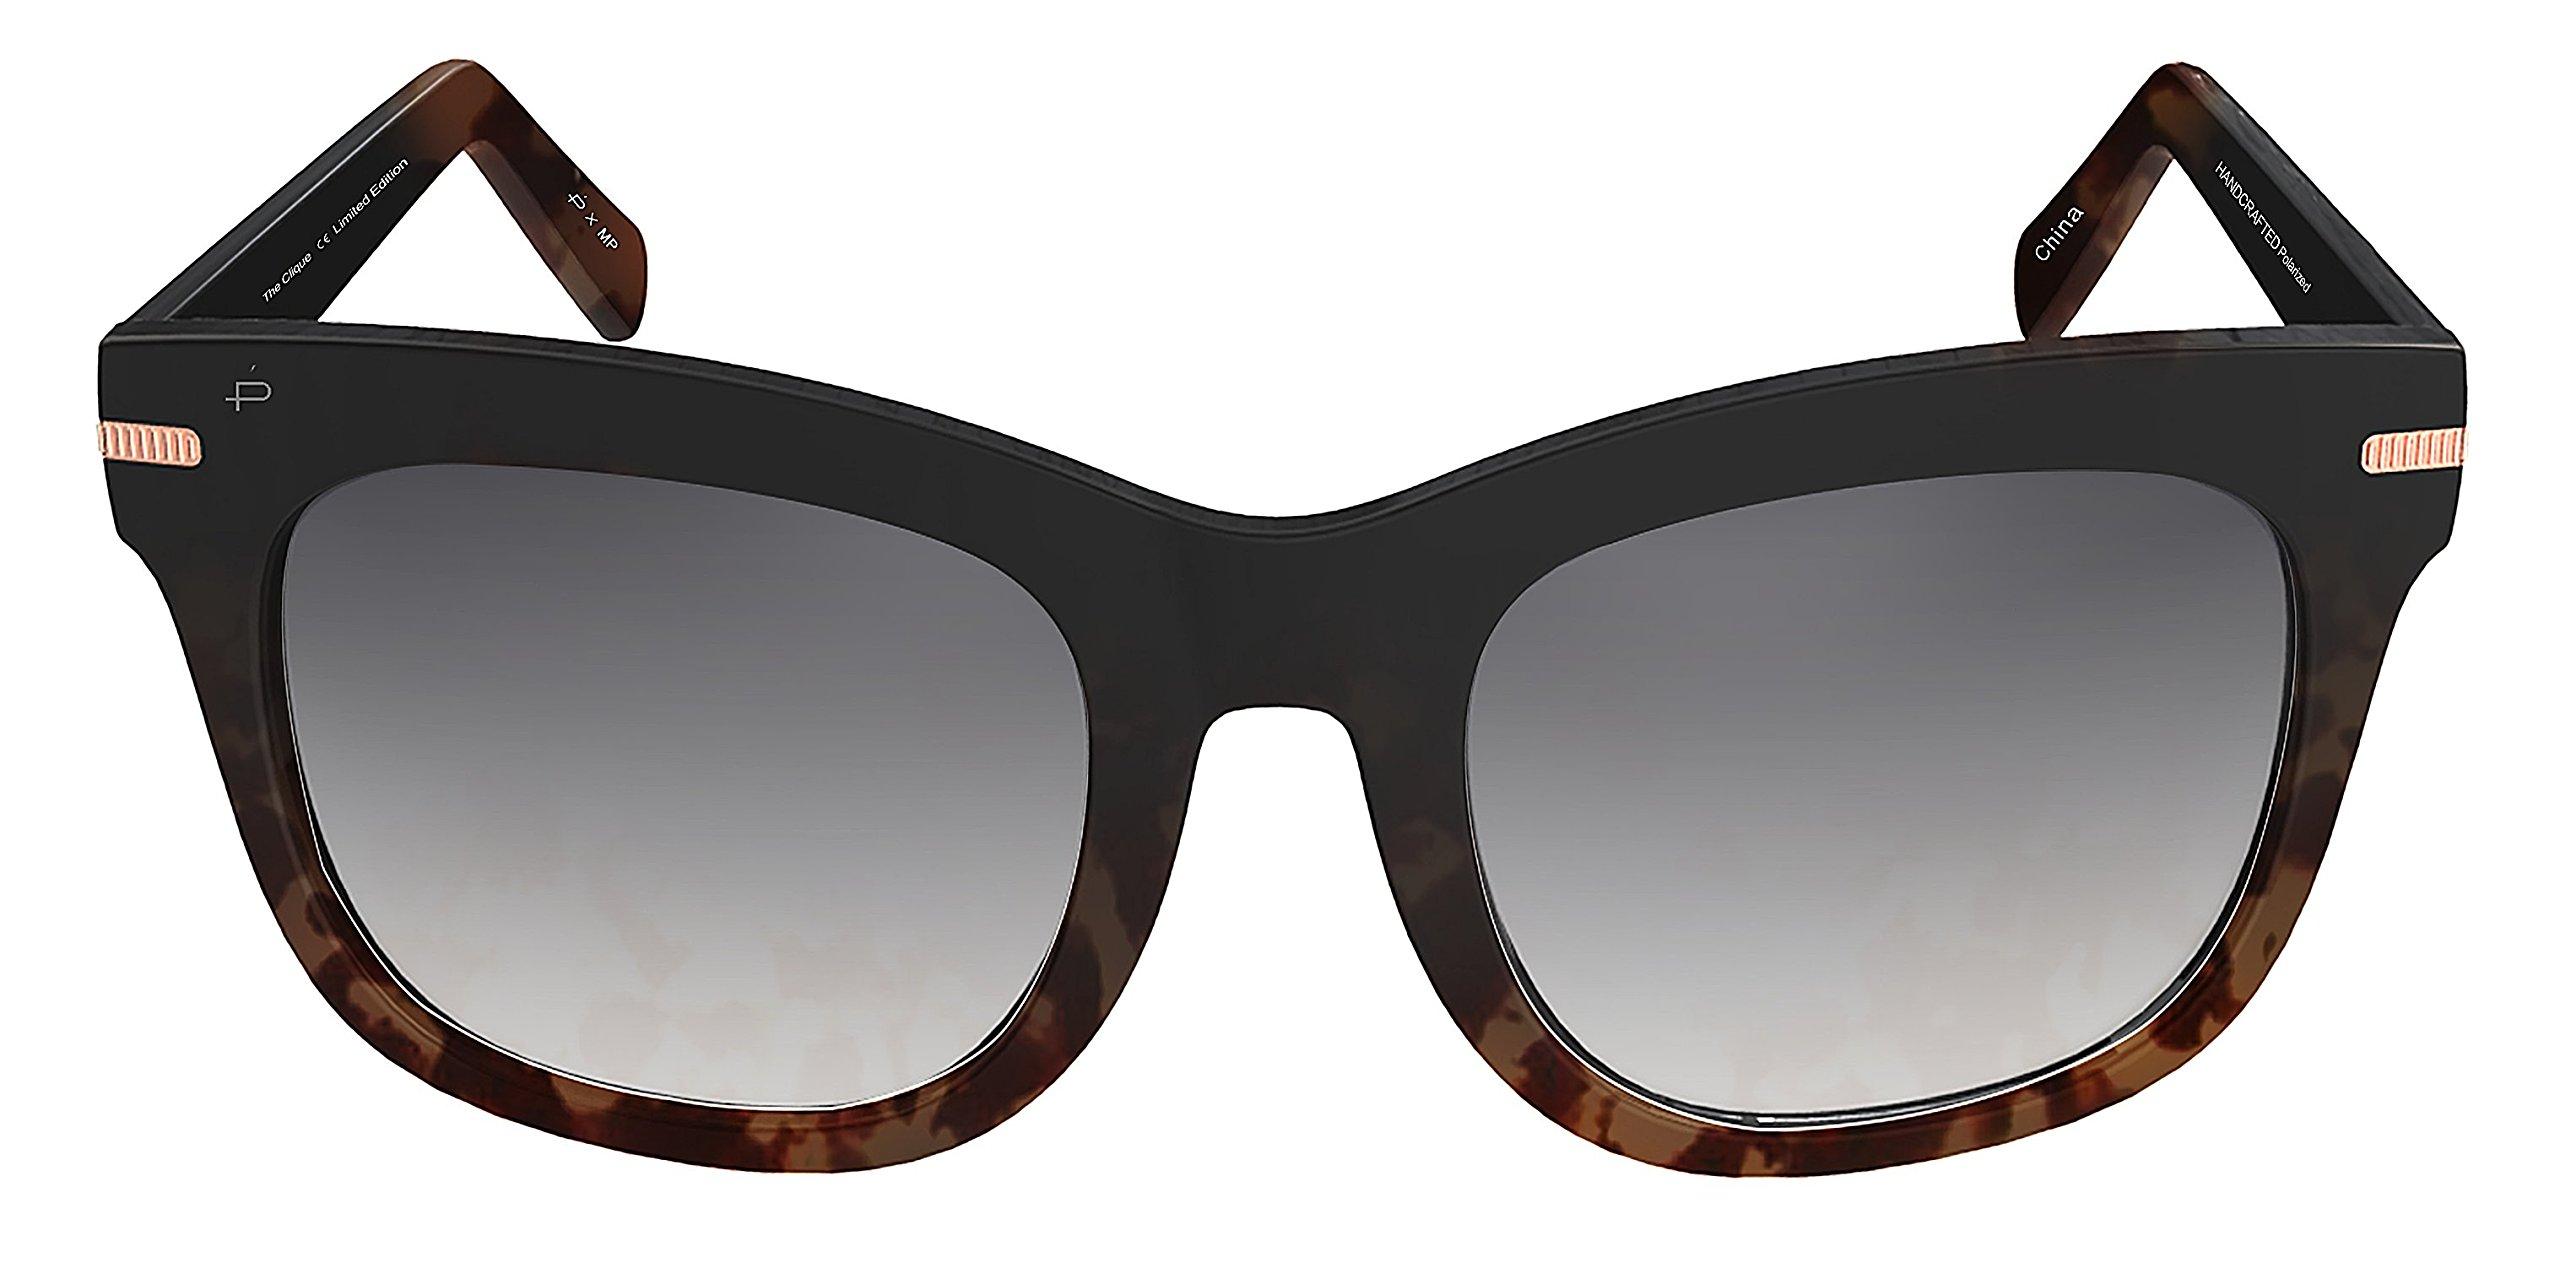 "ویکالا · خرید  اصل اورجینال · خرید از آمازون · PRIVÉ REVAUX Madelaine Collection ""Clique"" Handcrafted Designer Sunglasses wekala · ویکالا"